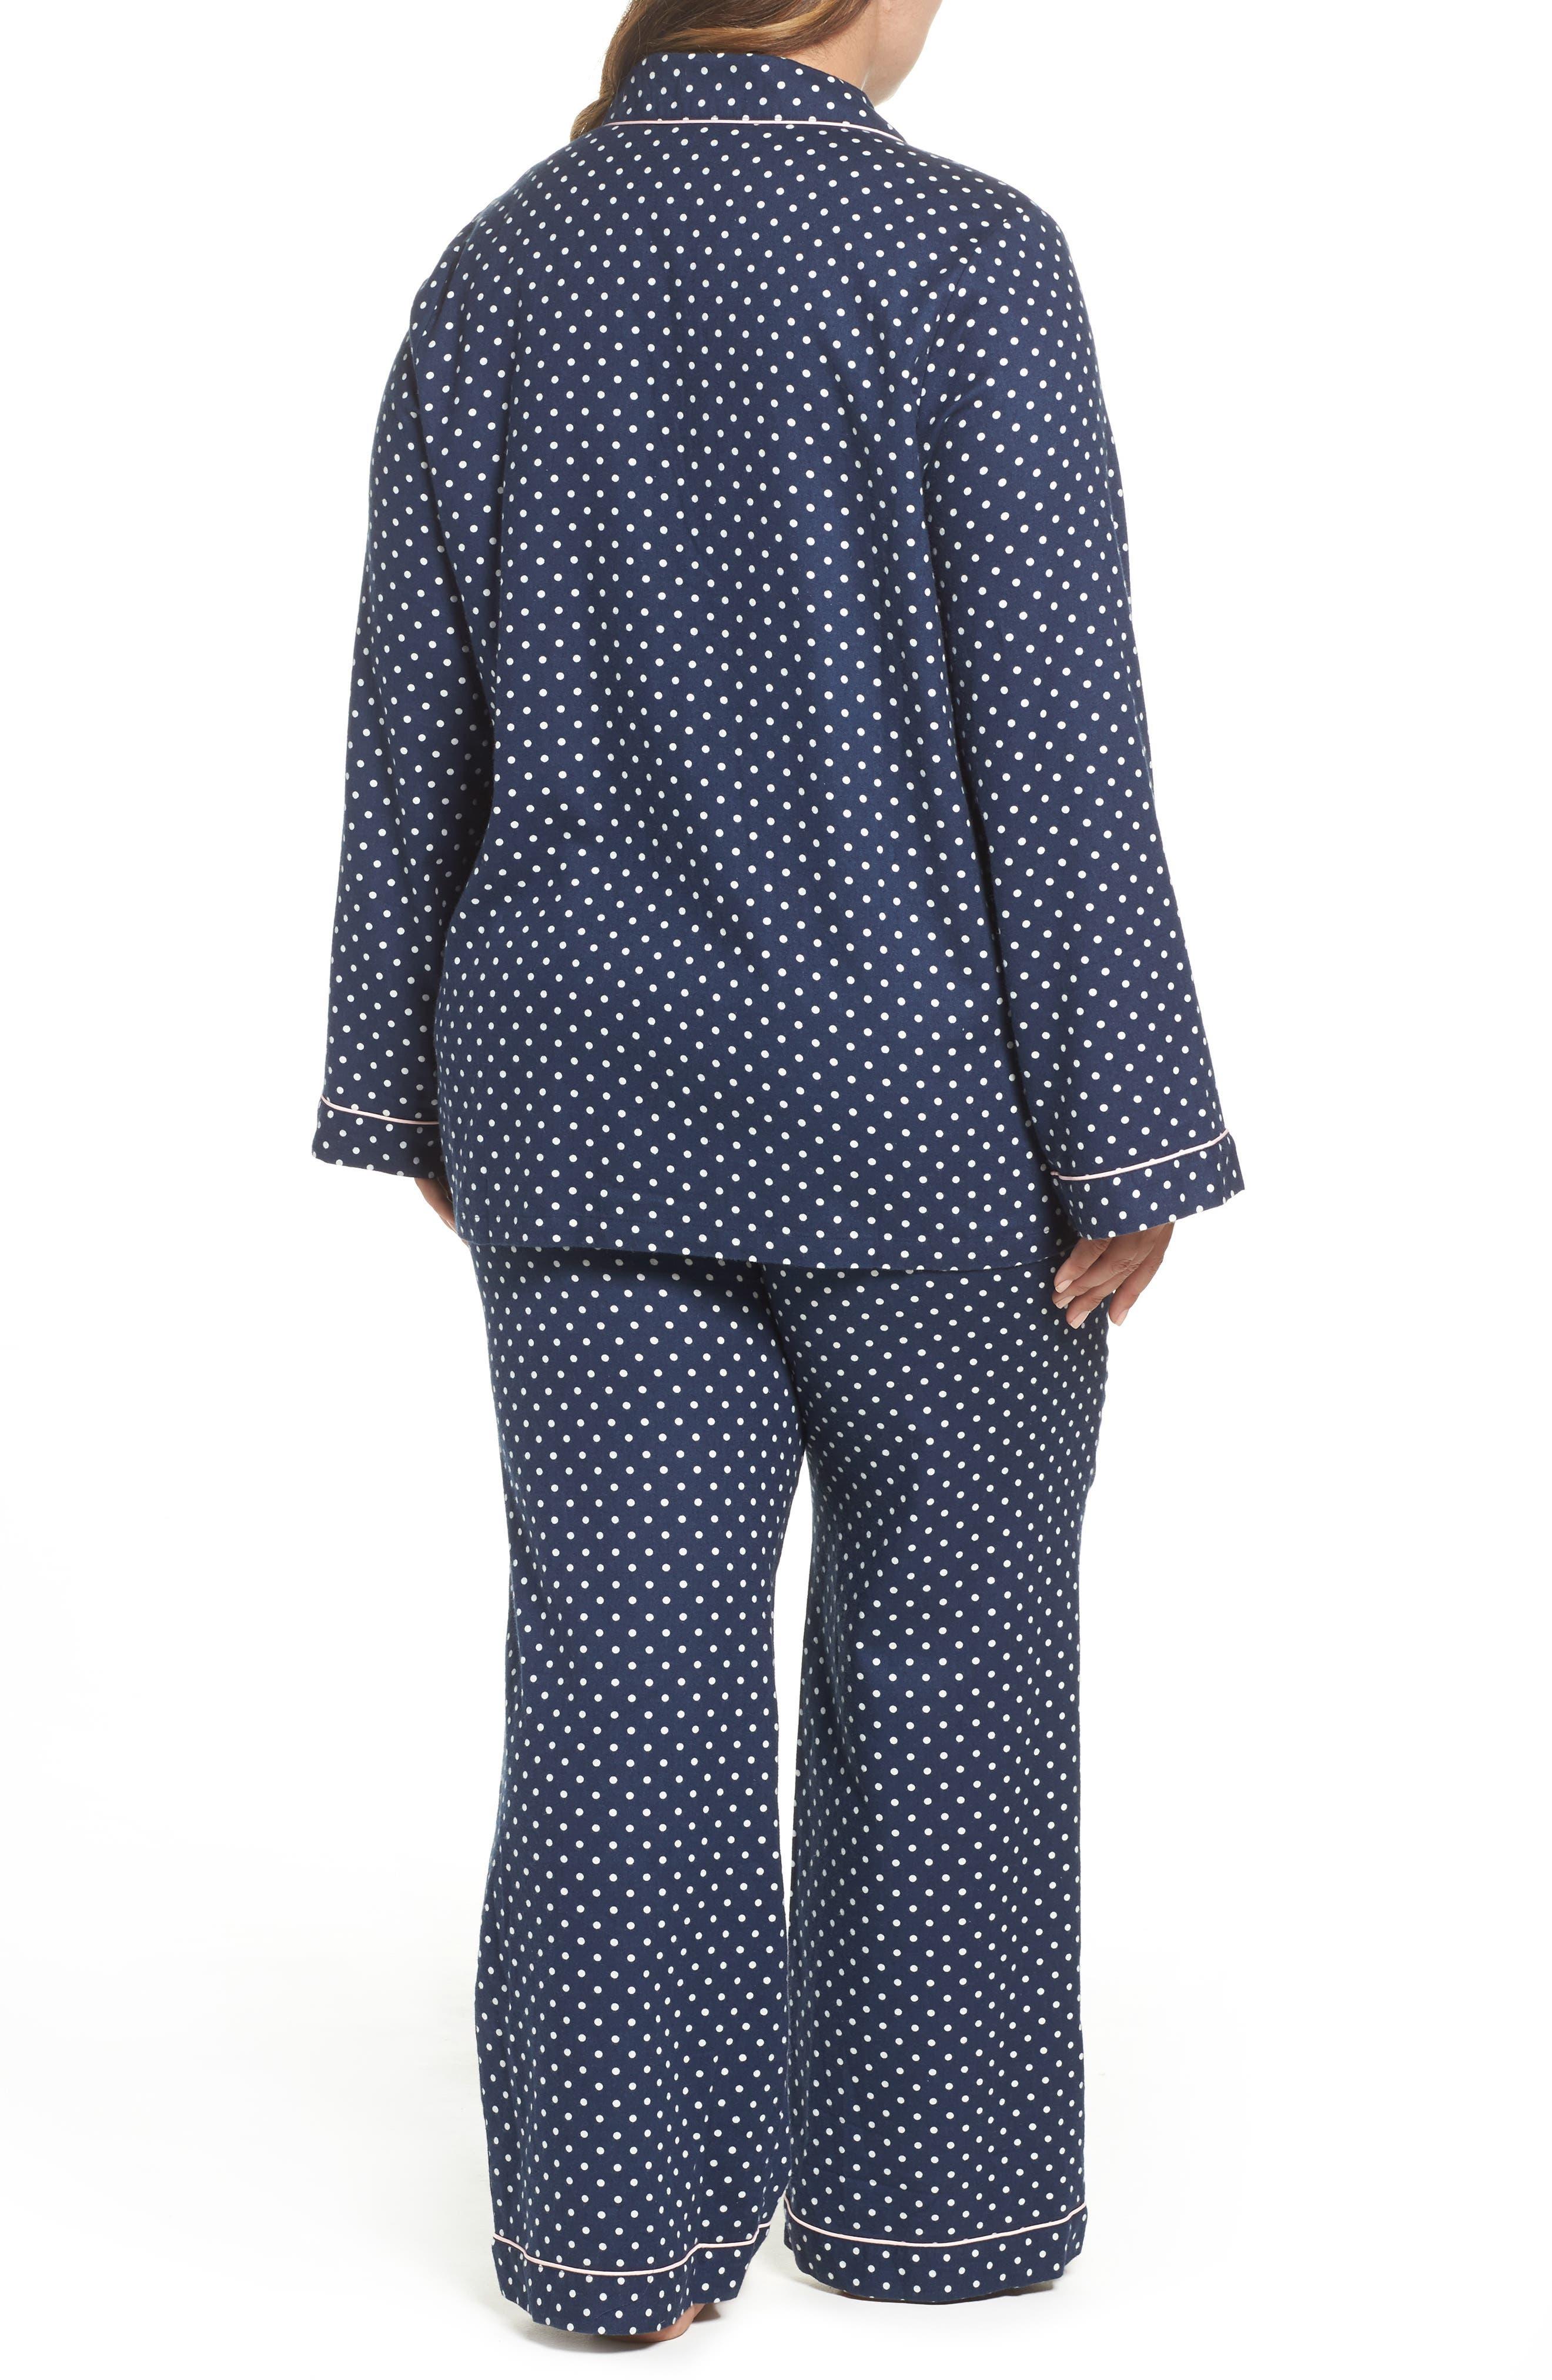 Alternate Image 2  - Nordstrom Lingerie Cotton Twill Pajamas (Plus Size)